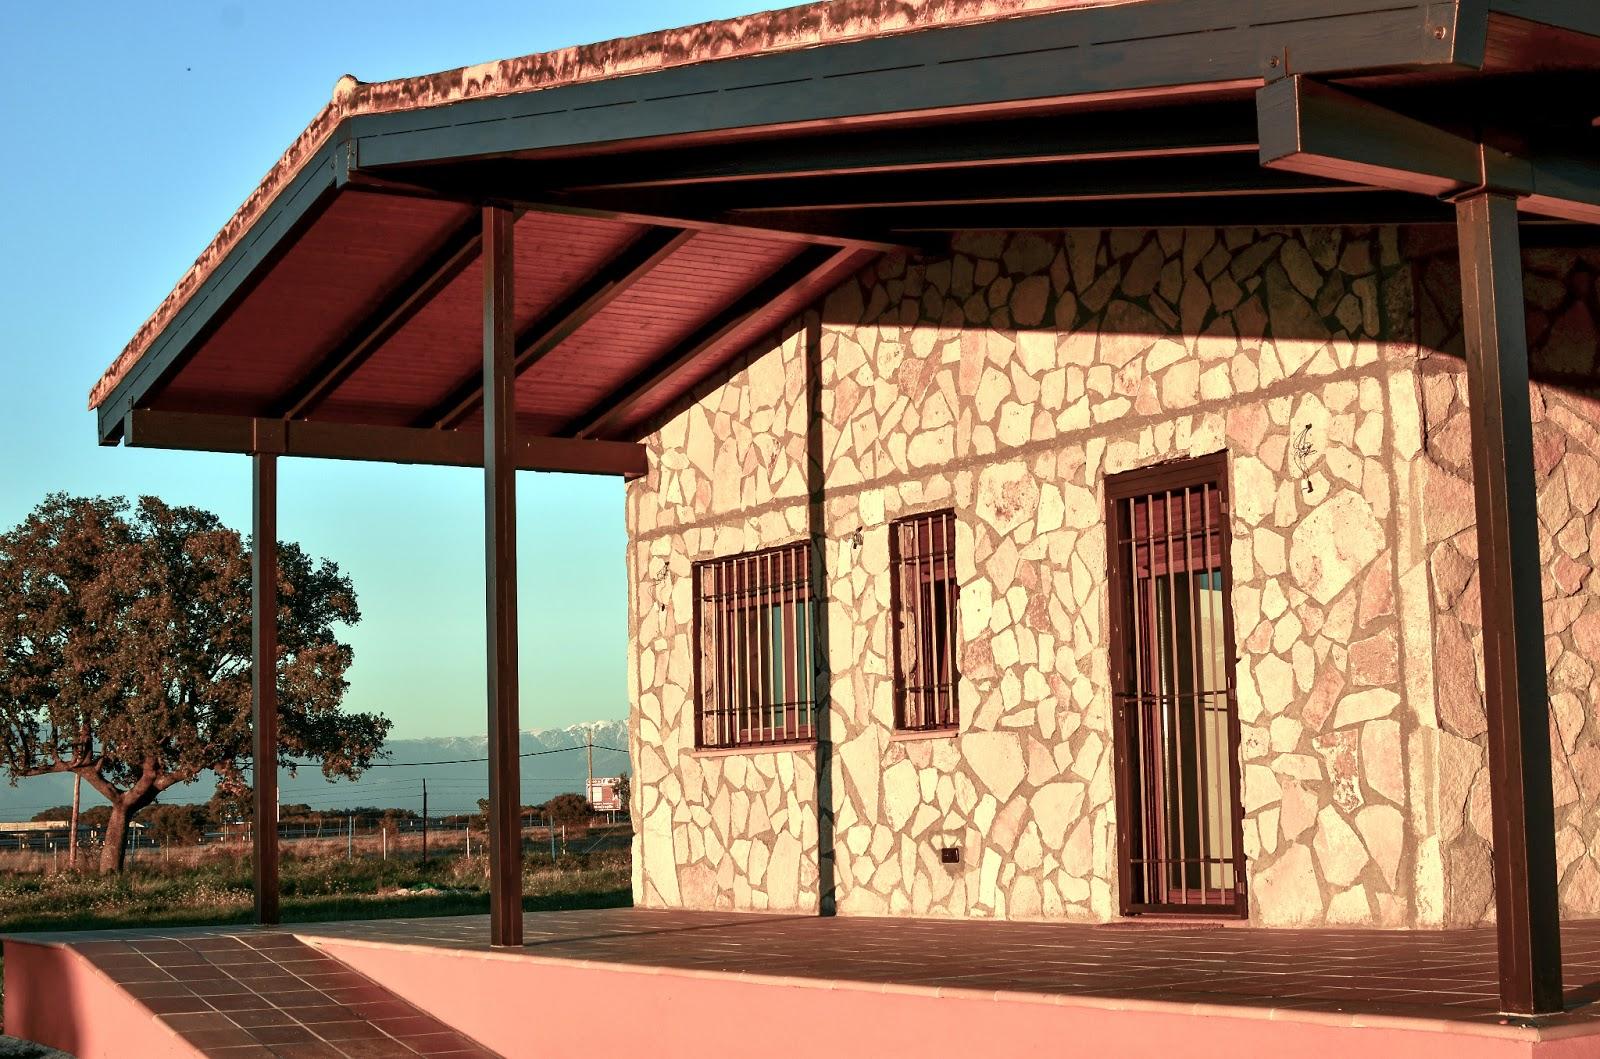 Casas prefabricadas madera casas de hormigon - Modelos de casas prefabricadas de hormigon y precios ...